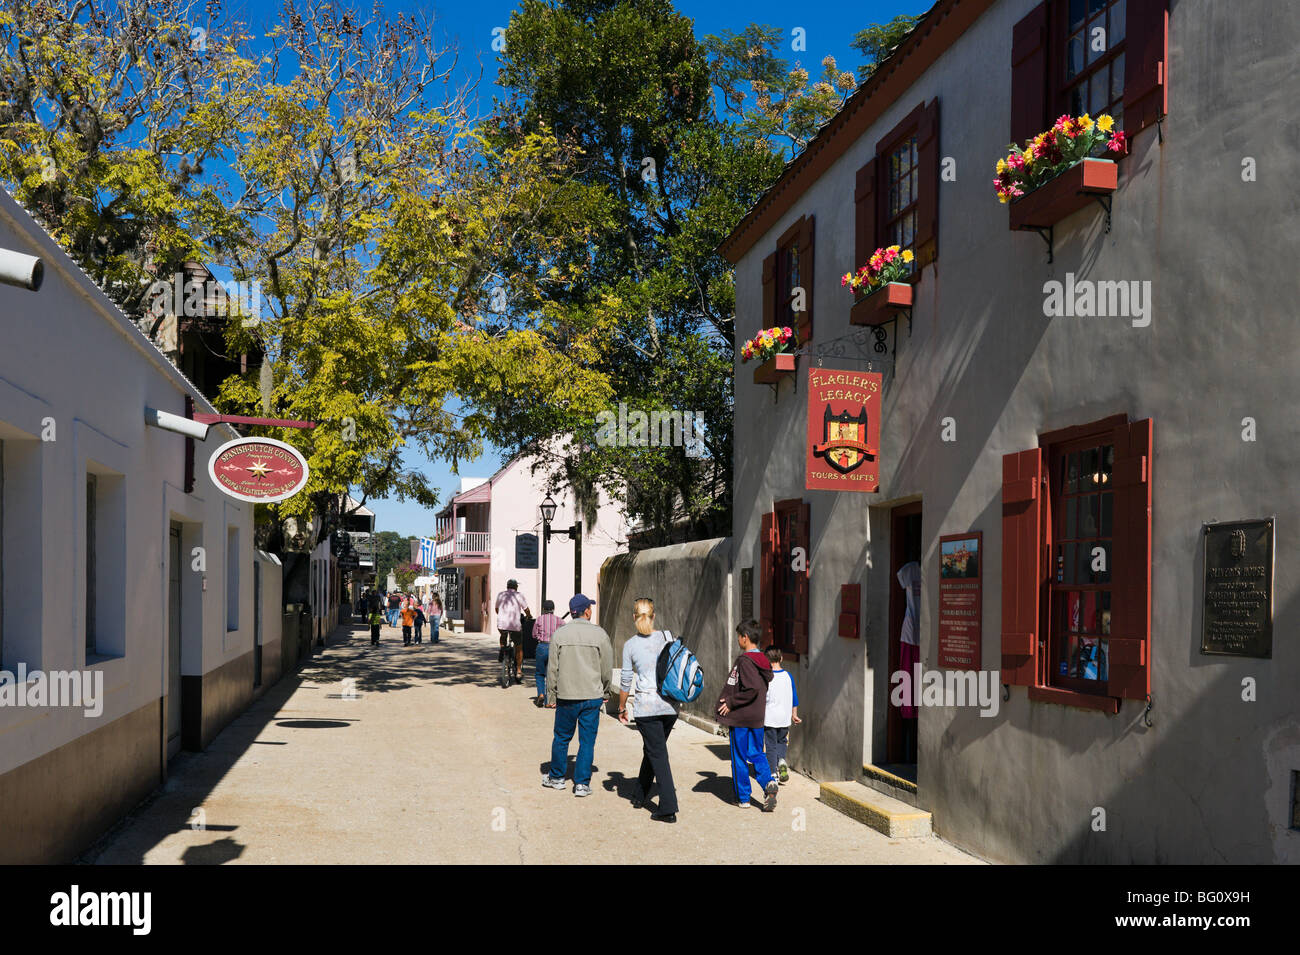 St George Street pedestrian mall, St Augustine, Florida, USA - Stock Image